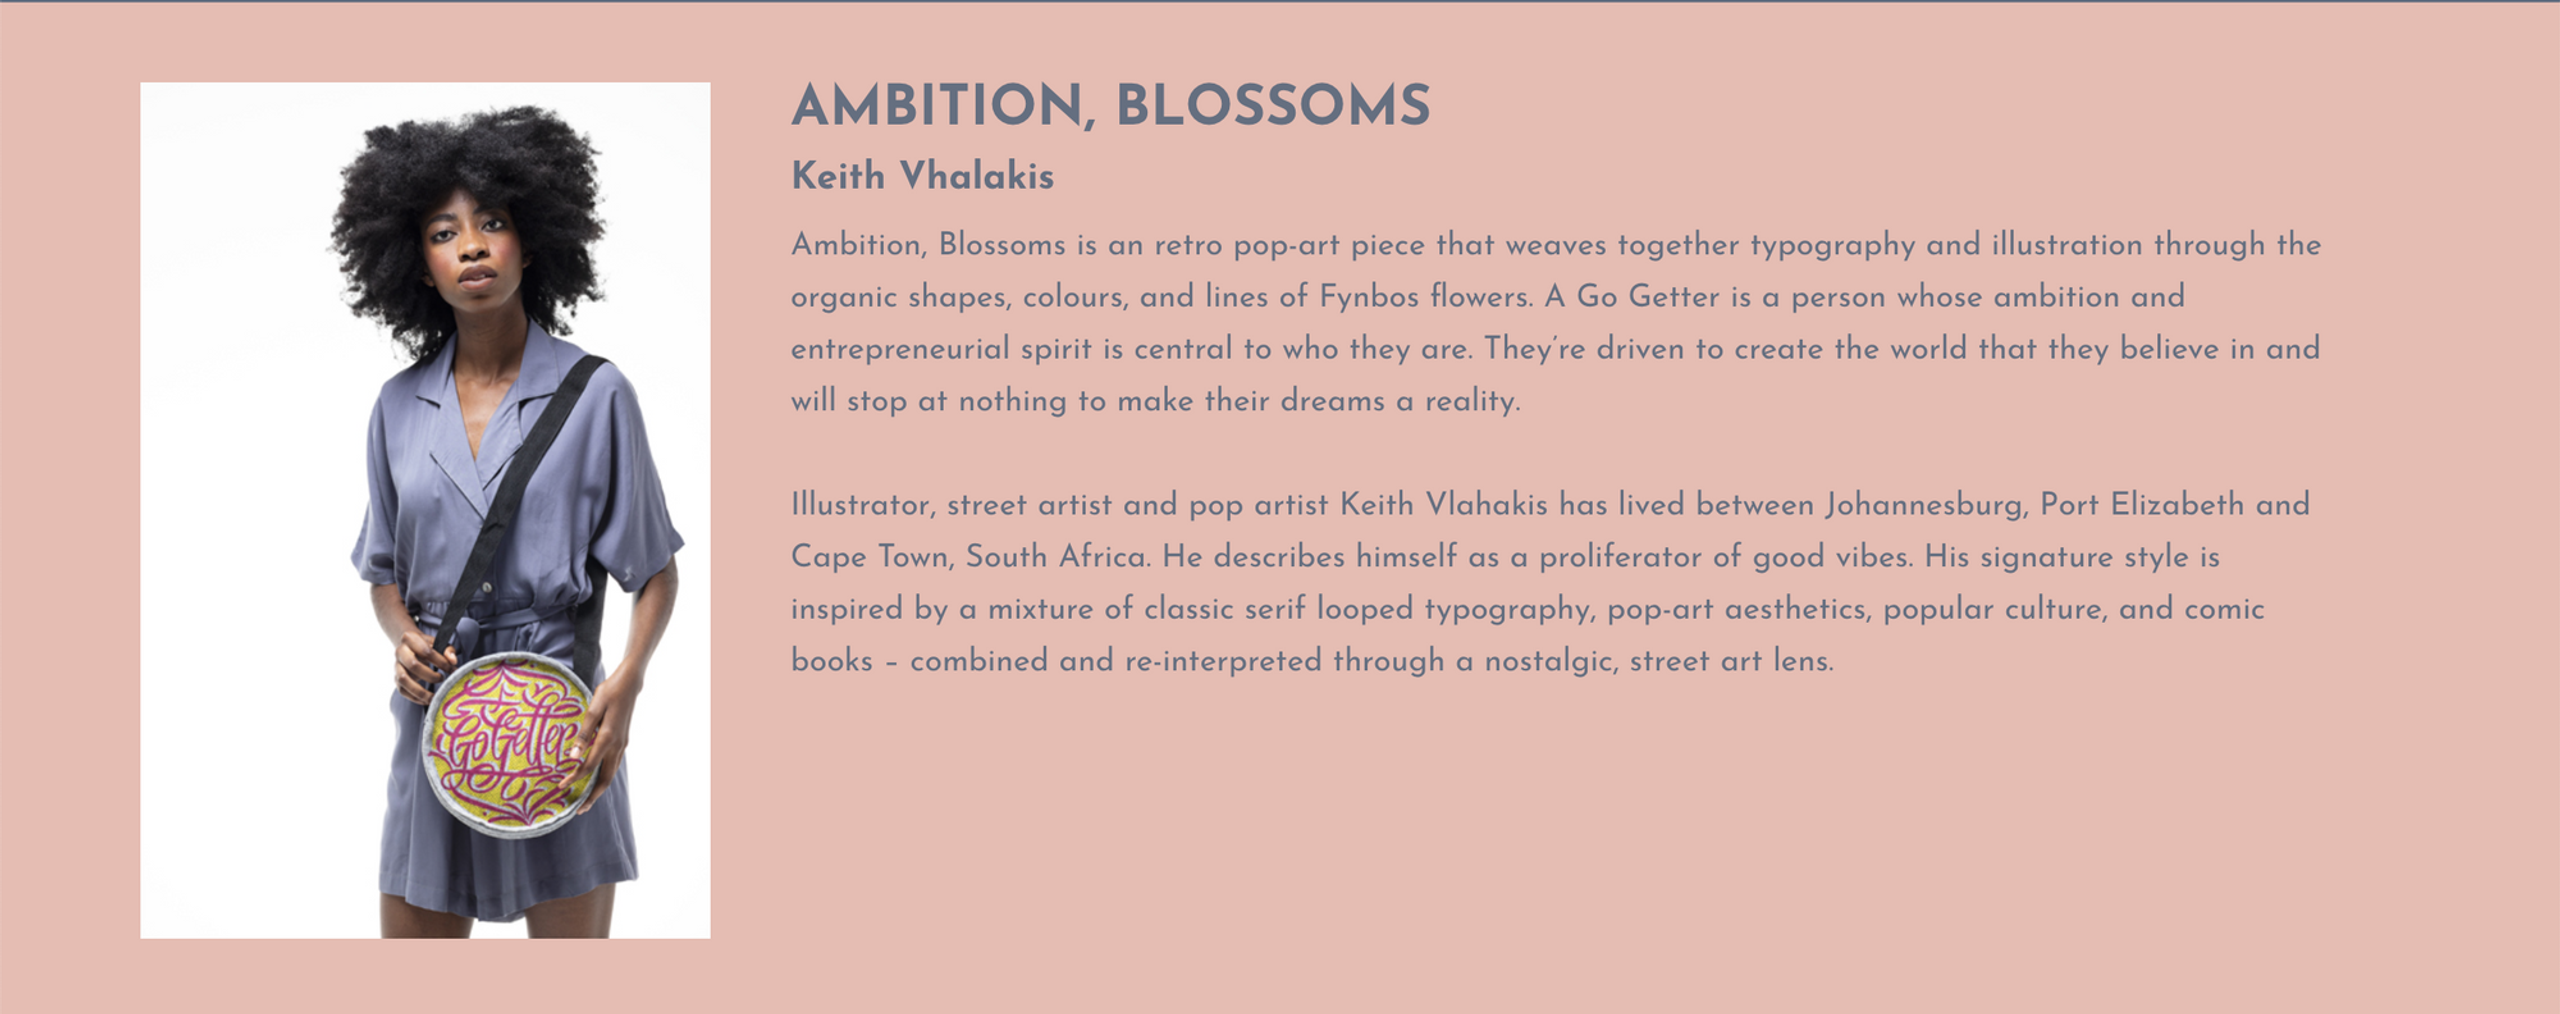 Ambition, blossoms.